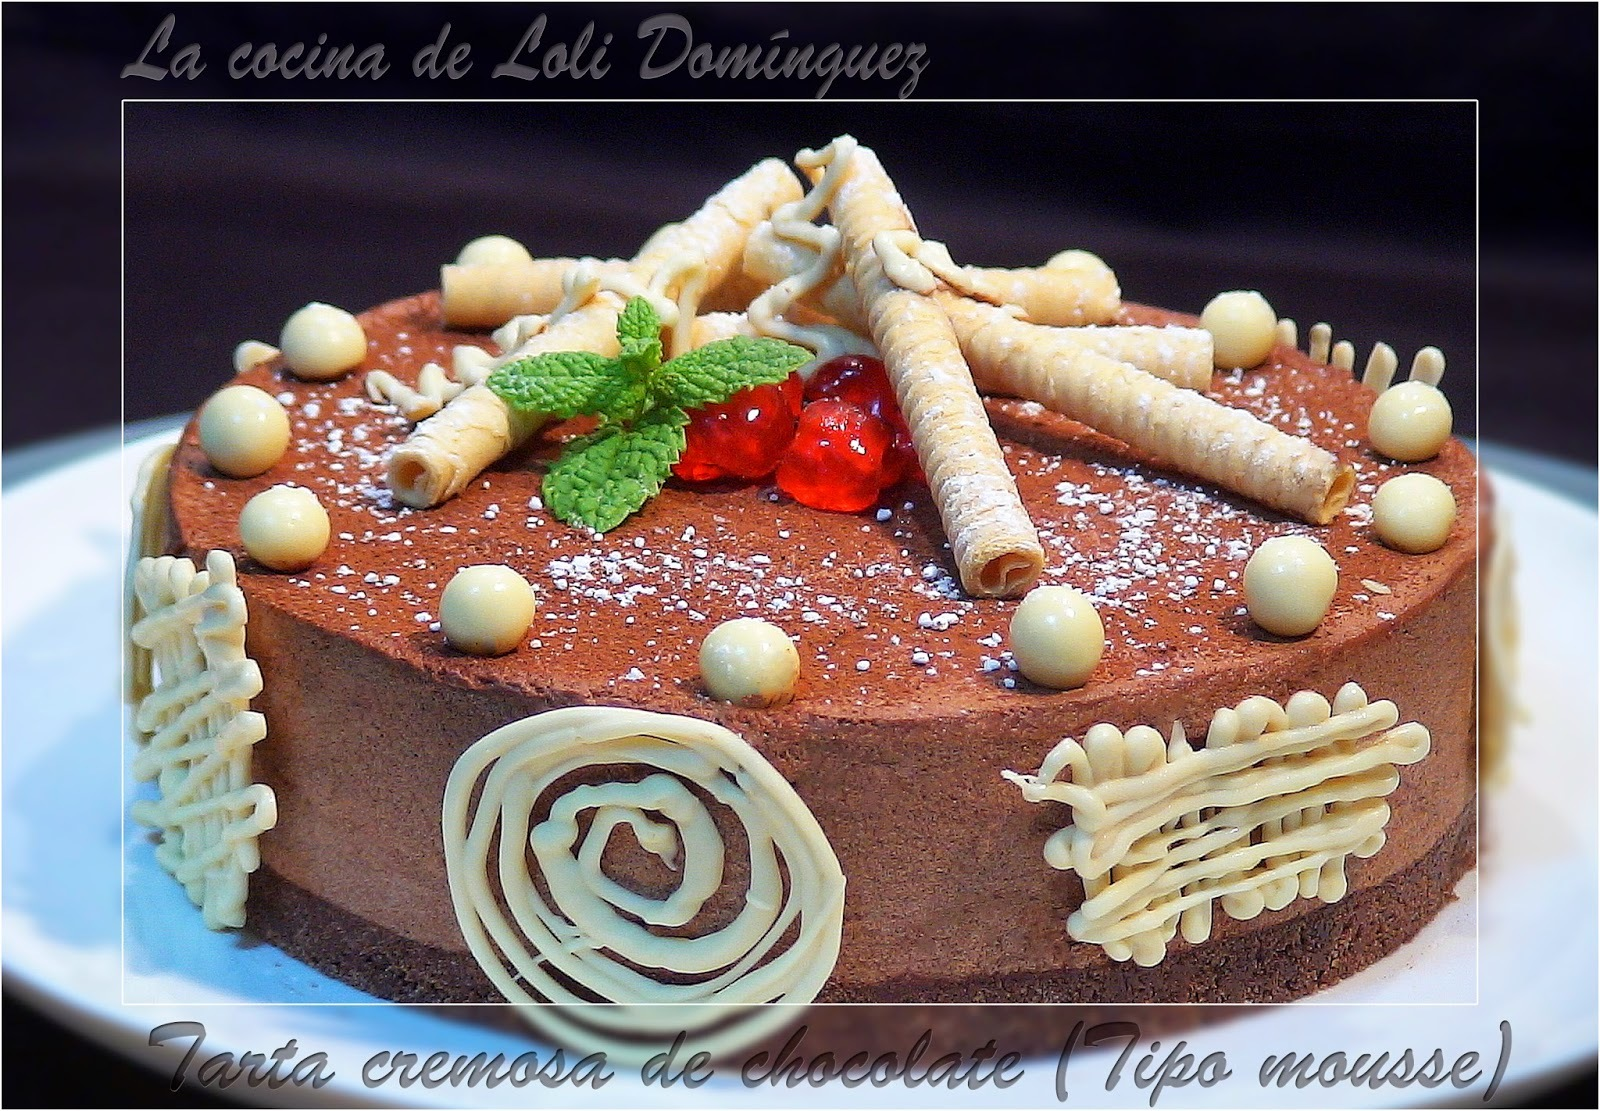 Tarta cremosa de chocolate (Tipo mousse).